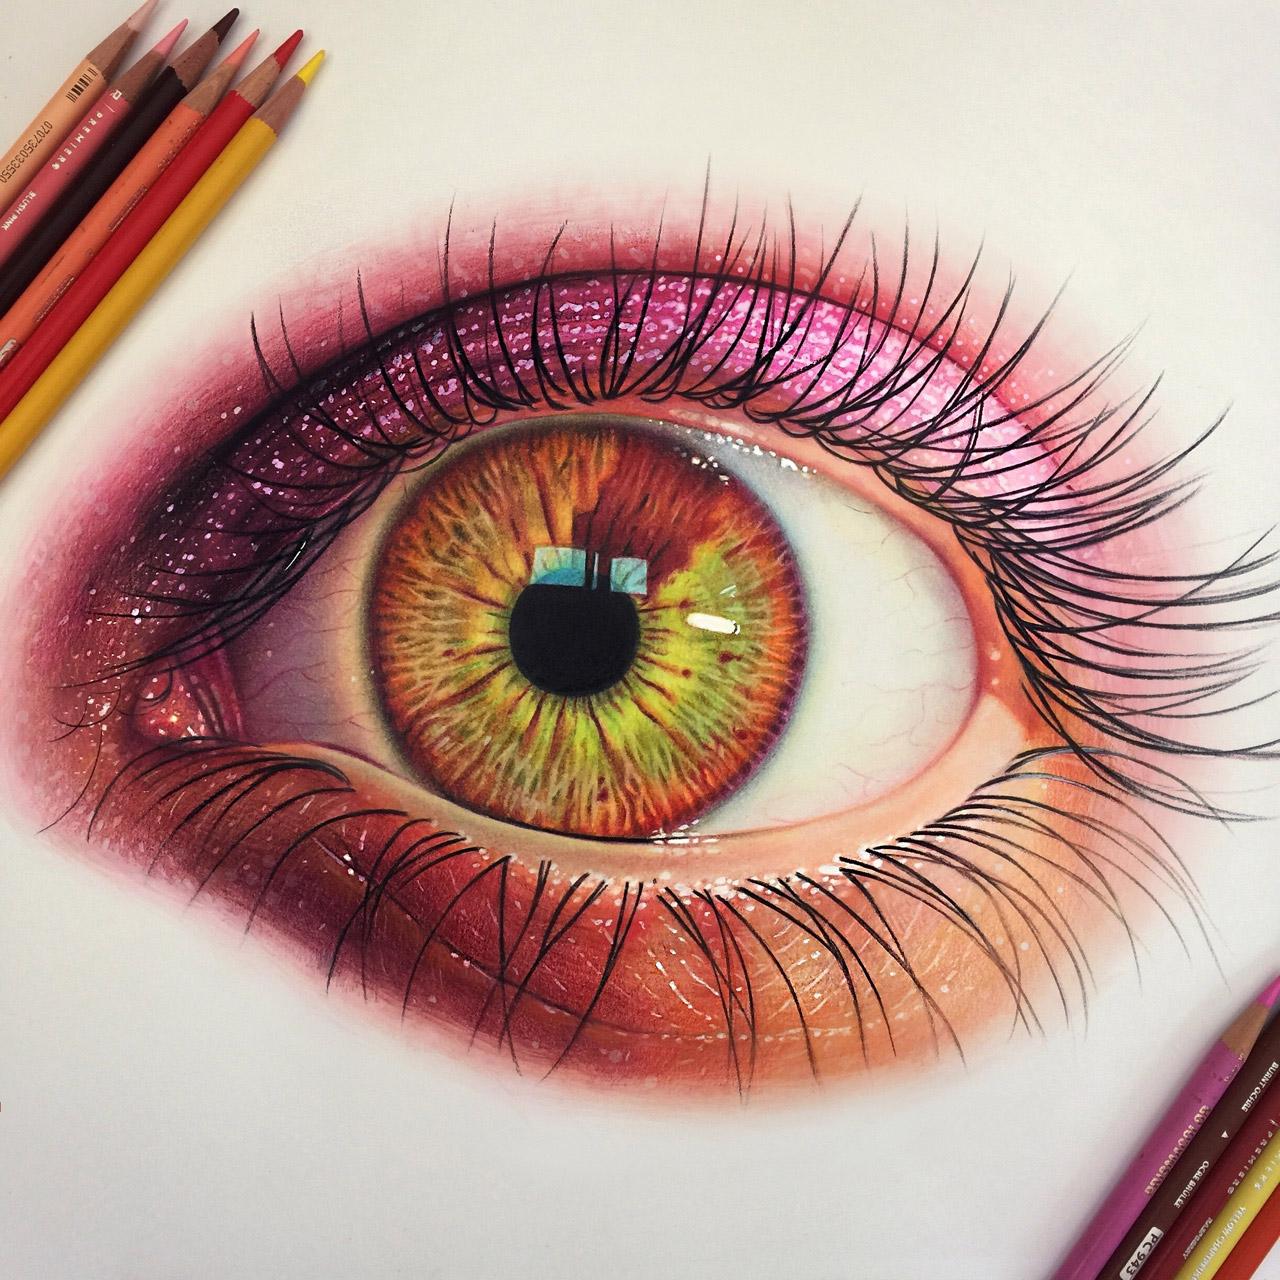 Realistic Pencil Drawings by Morgan Davidson